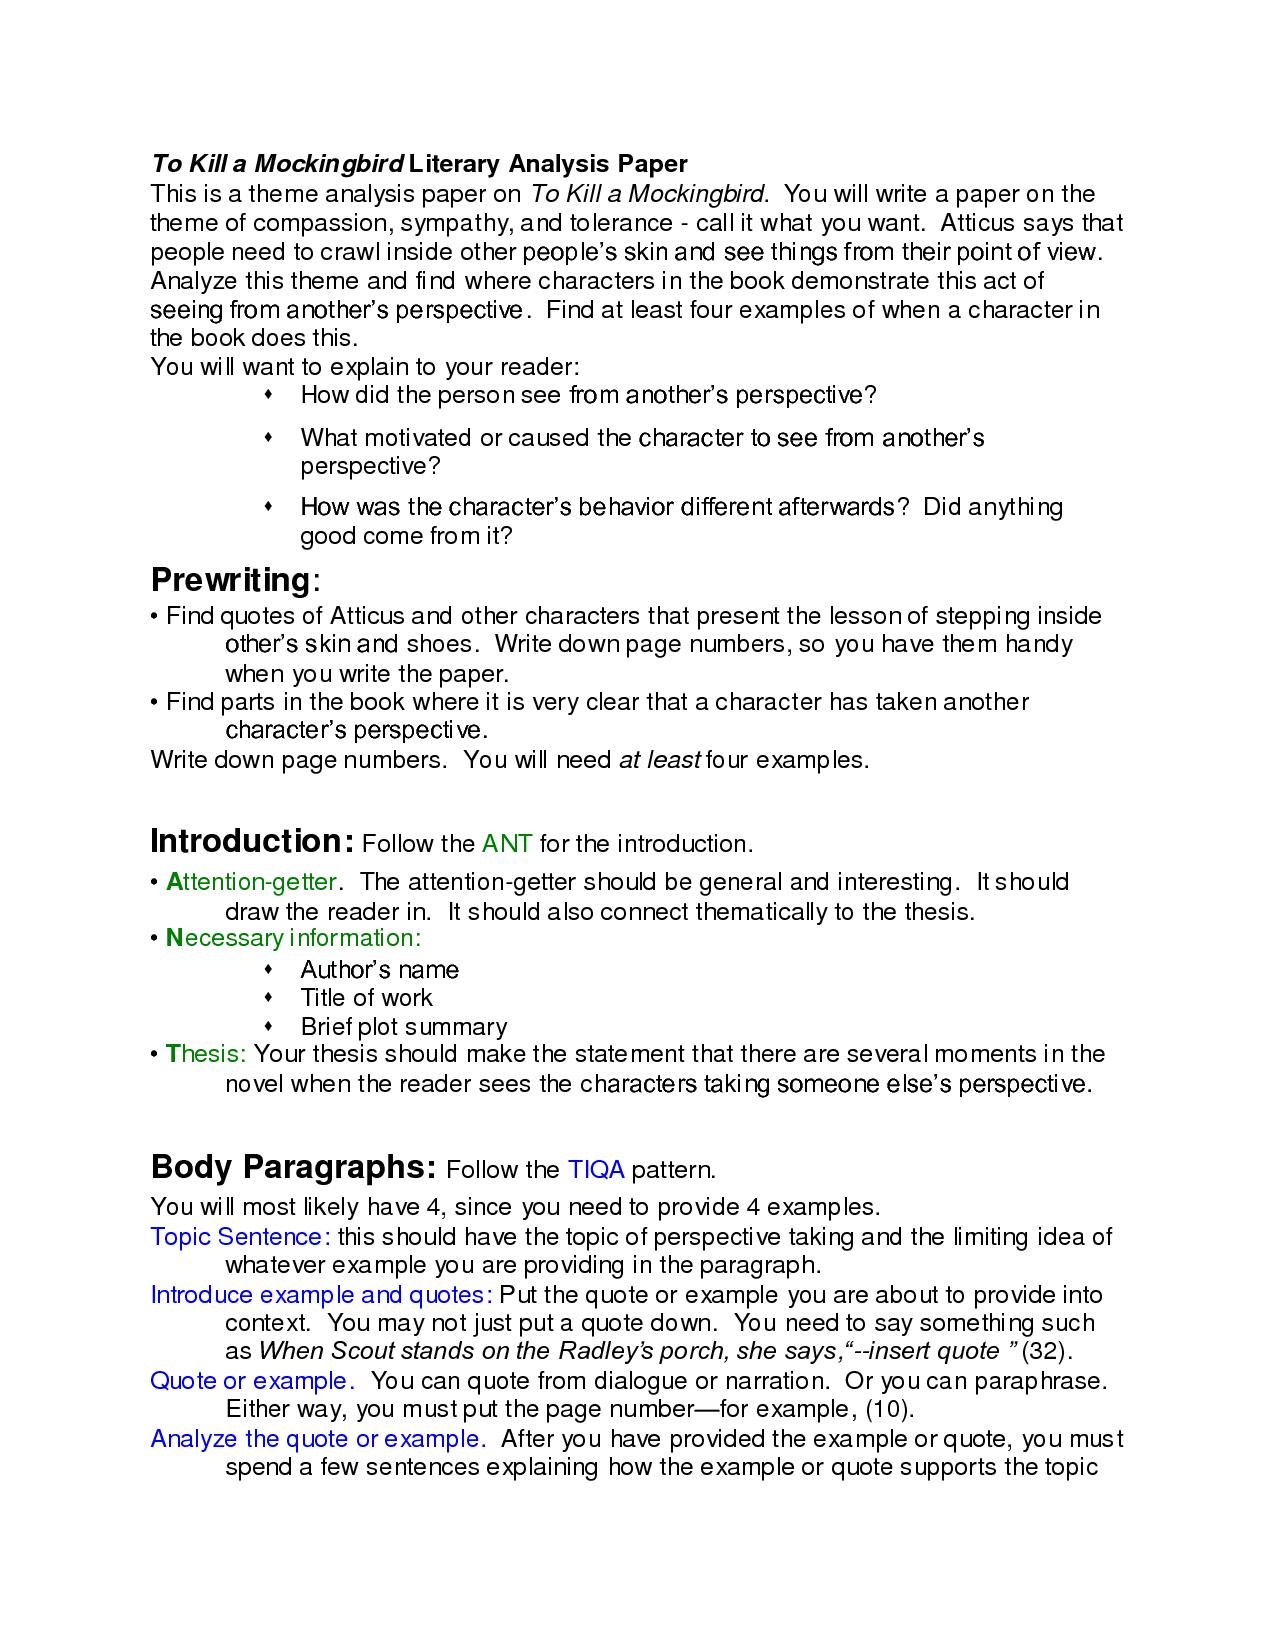 To kill a mockingbird theme courage essay